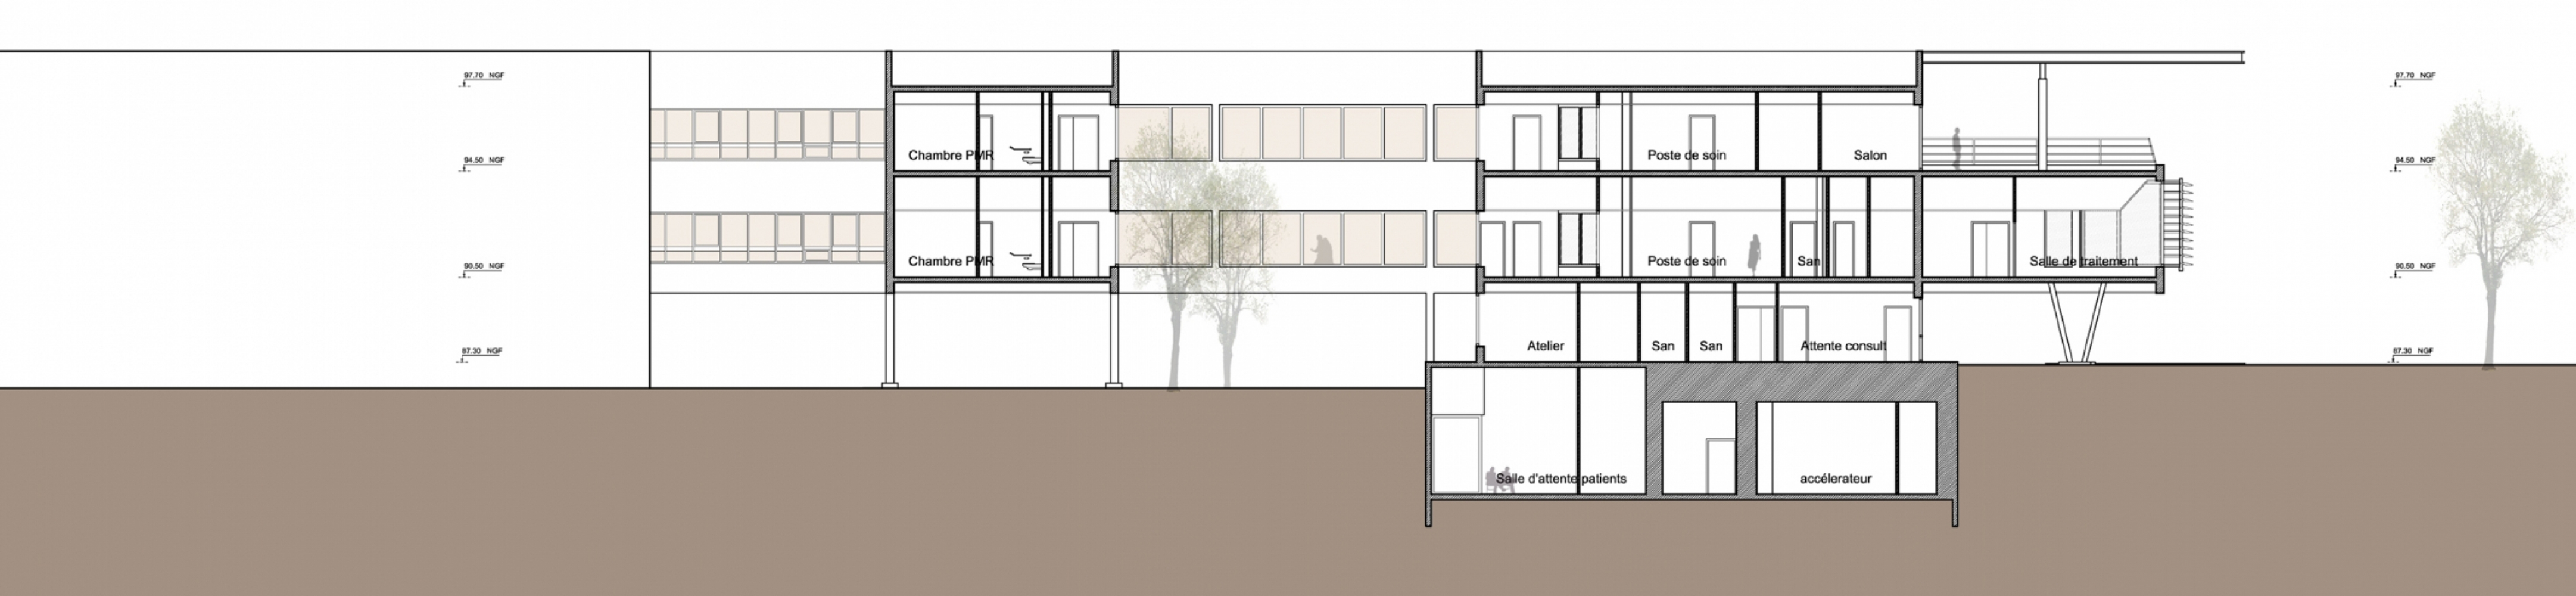 beauvais02 Pascale SEURIN Architecte - Pascale SEURIN Architecte